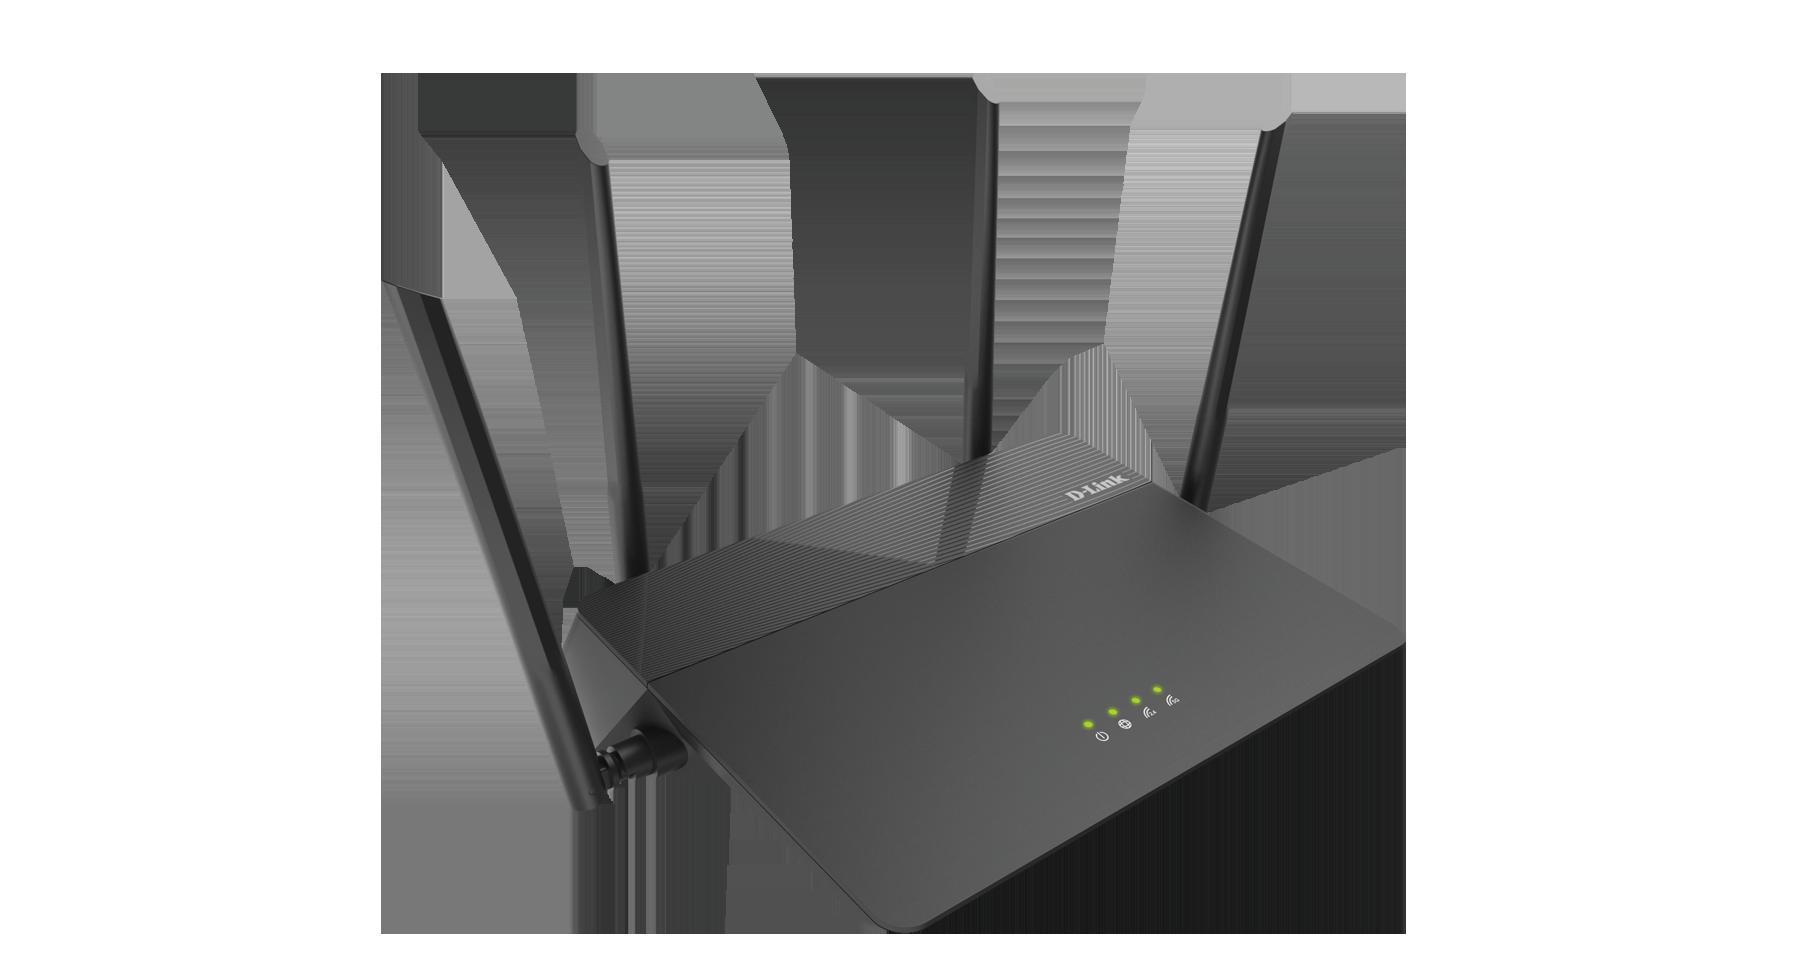 DLINK EXO AC1900 MU-MIMO WI-FI ROUTER, DIR-878, IEEE 802.11 ac/n/g/b/a wireless LAN, 10/100/1000 Gigabit Ethernet WAN port, Four 10/100/1000 Gigabit Ethernet LAN ports, 2.4 GHz: Up to 600 Mbps, 5 GHz: Up to 1,300 Mbps, Four external antennas , Input: 100 to 240 V AC, 50/60 Hz, Output: 12 V, 1.5 A - imaginea 1